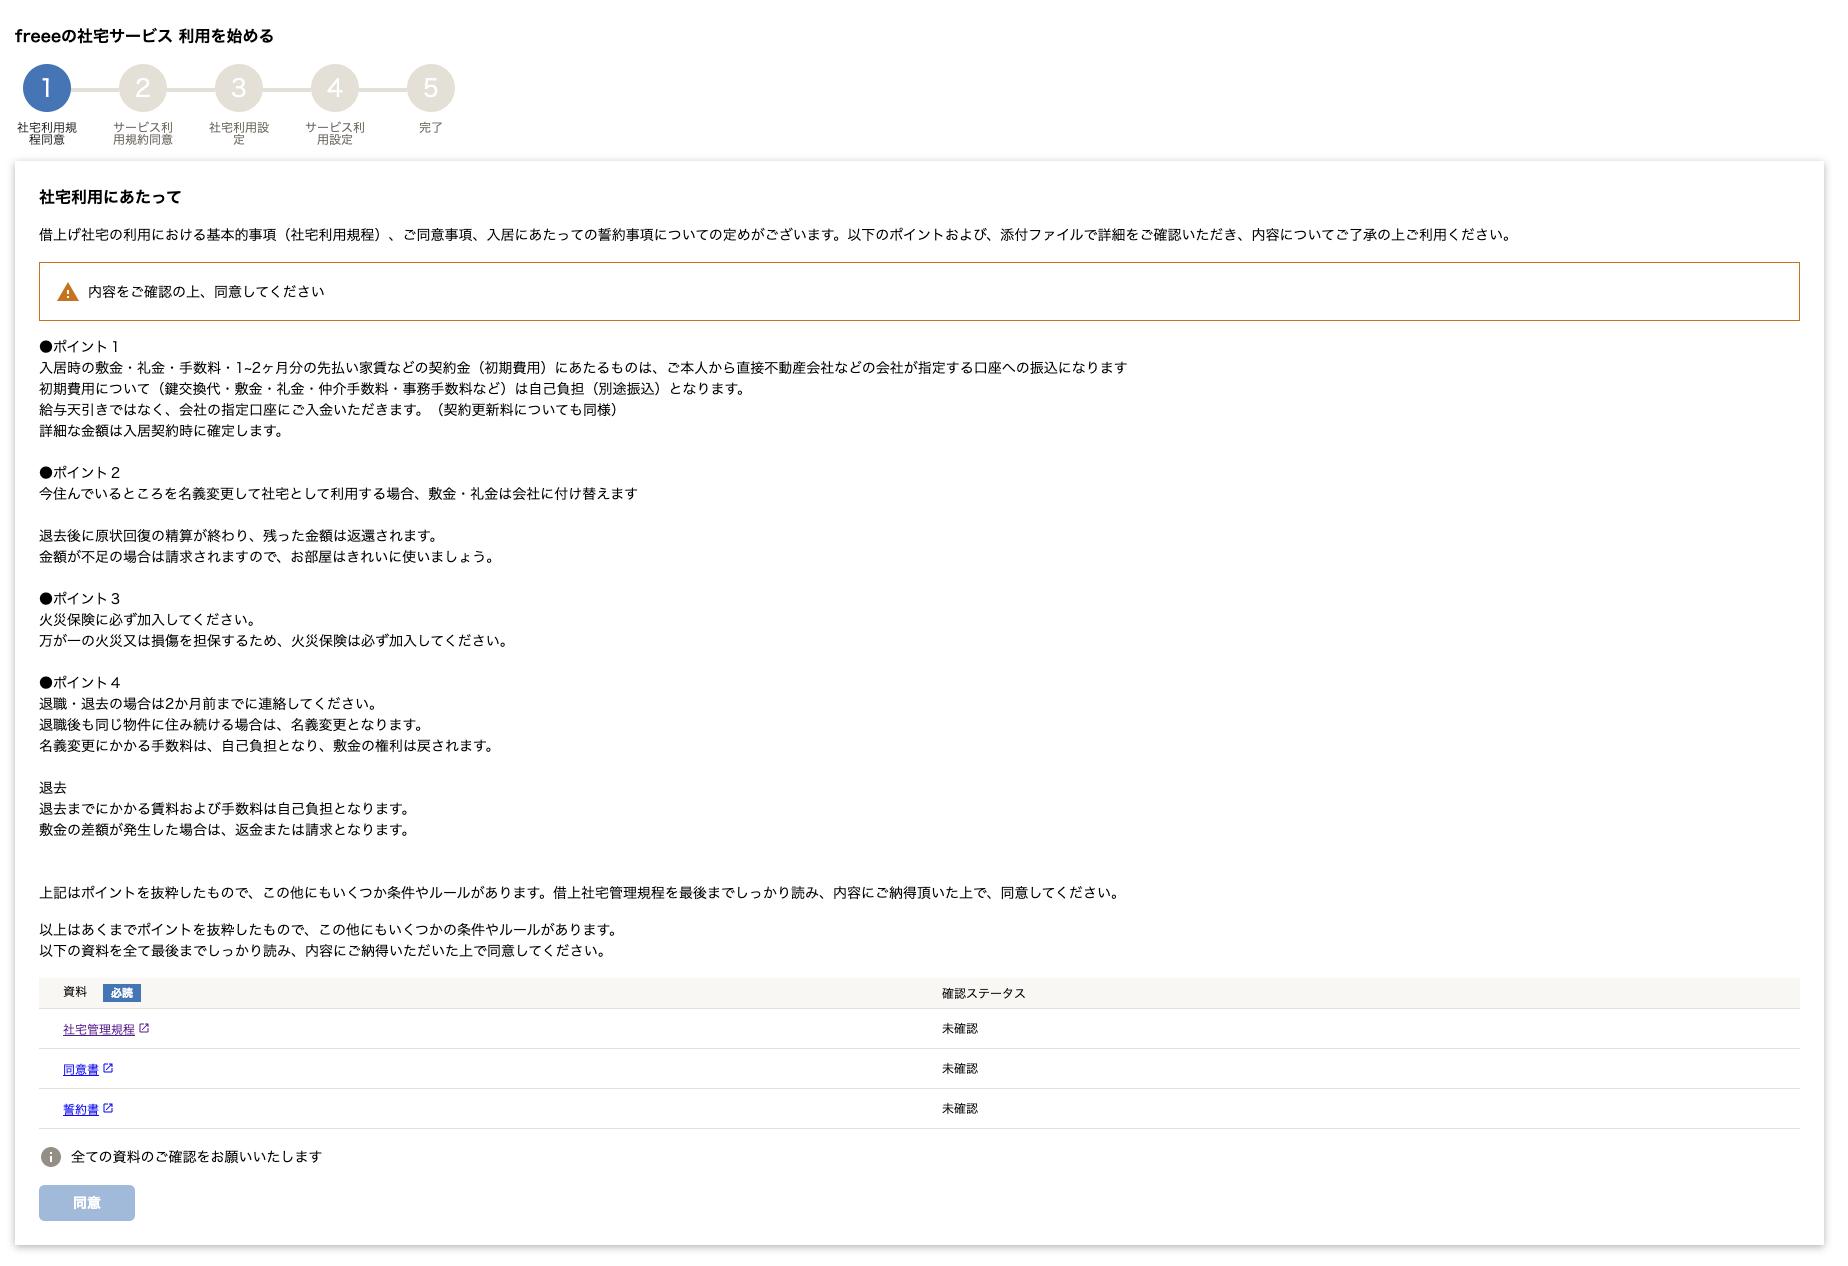 freeeの社宅サービス 利用を始めるの画面のスクリーンショット